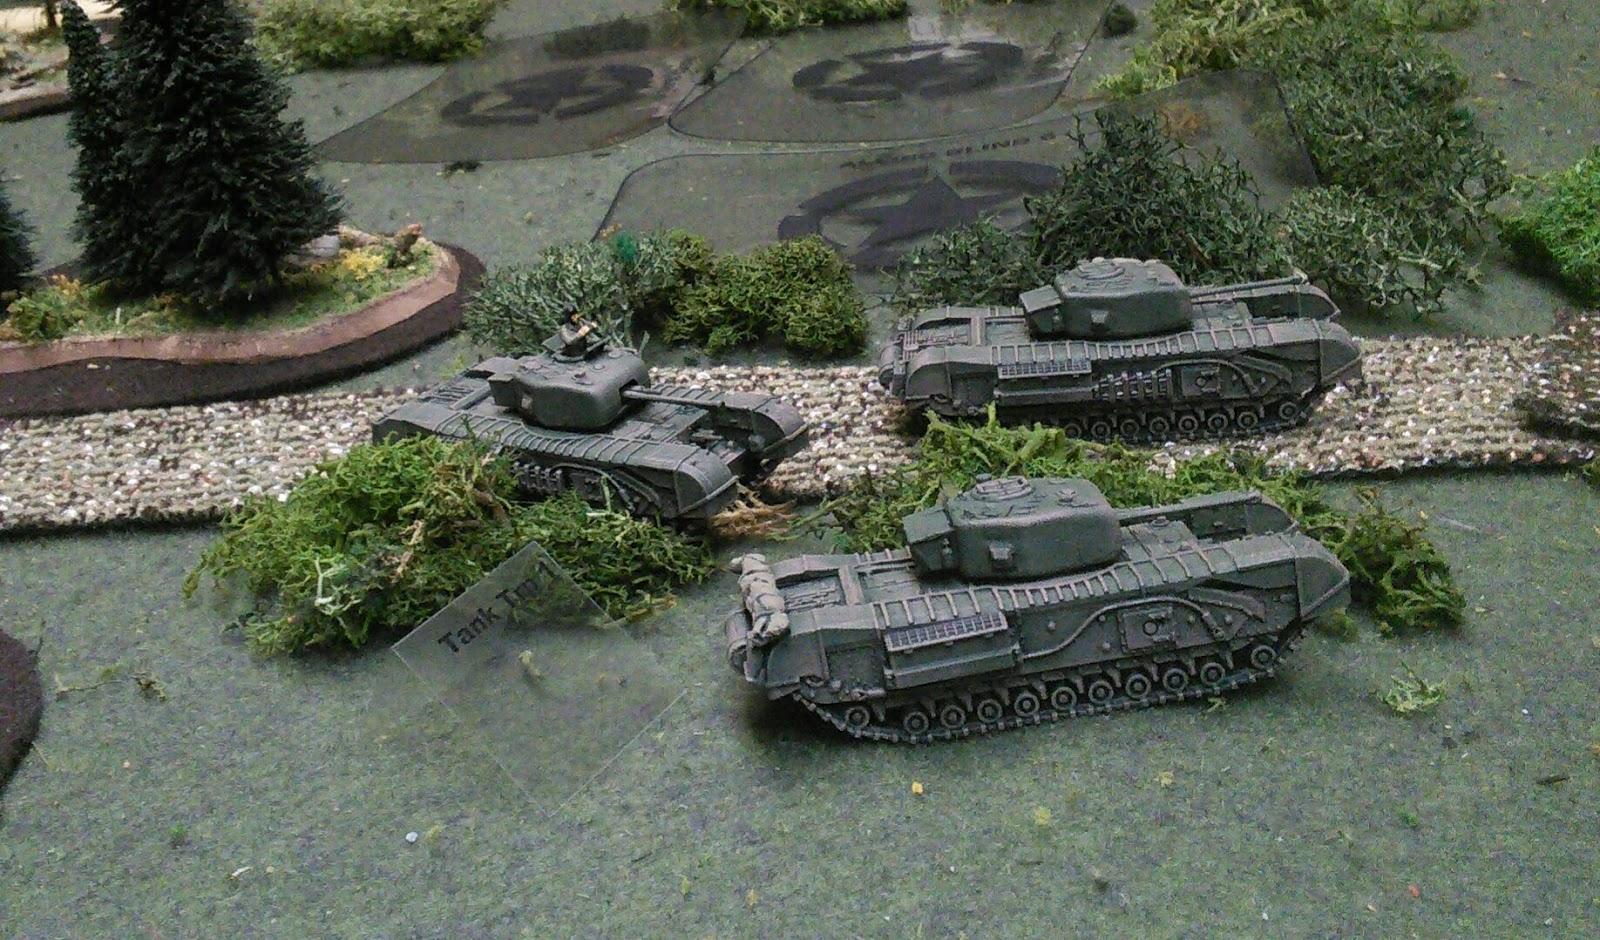 Churchills advancing